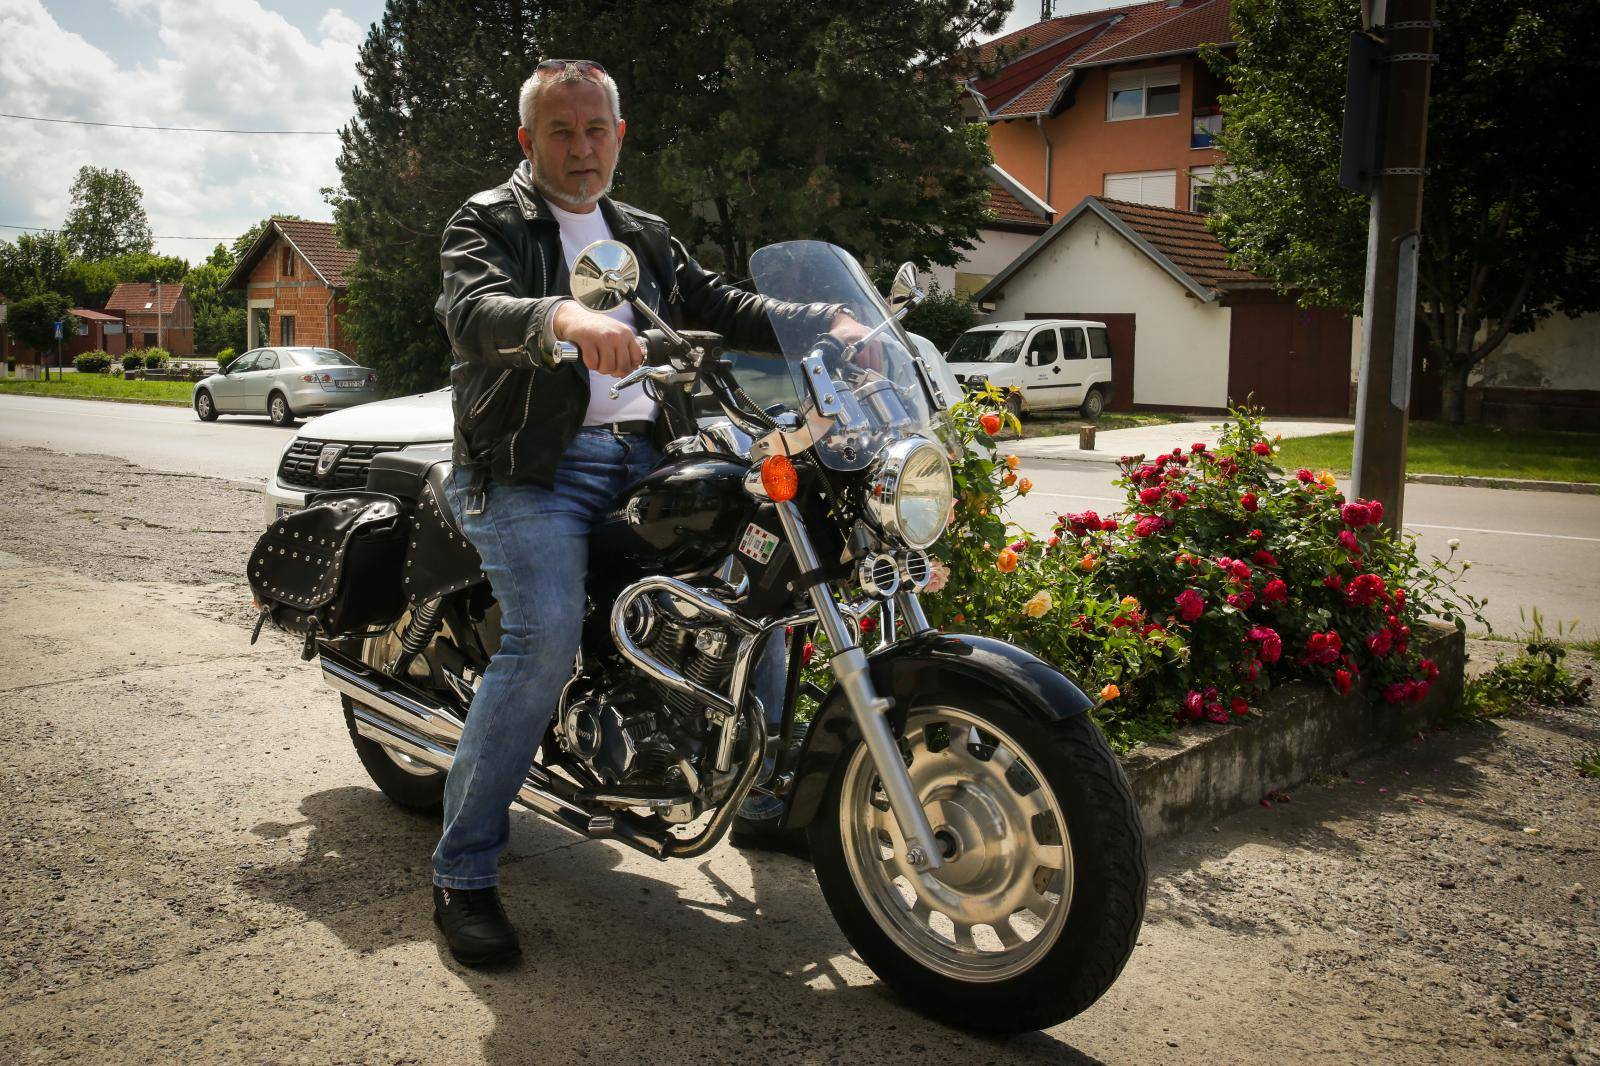 Branitelj pomaže siromašnima: 'Prodat ću svoj motocikl da 35 djece iz Vukovara ode na more'